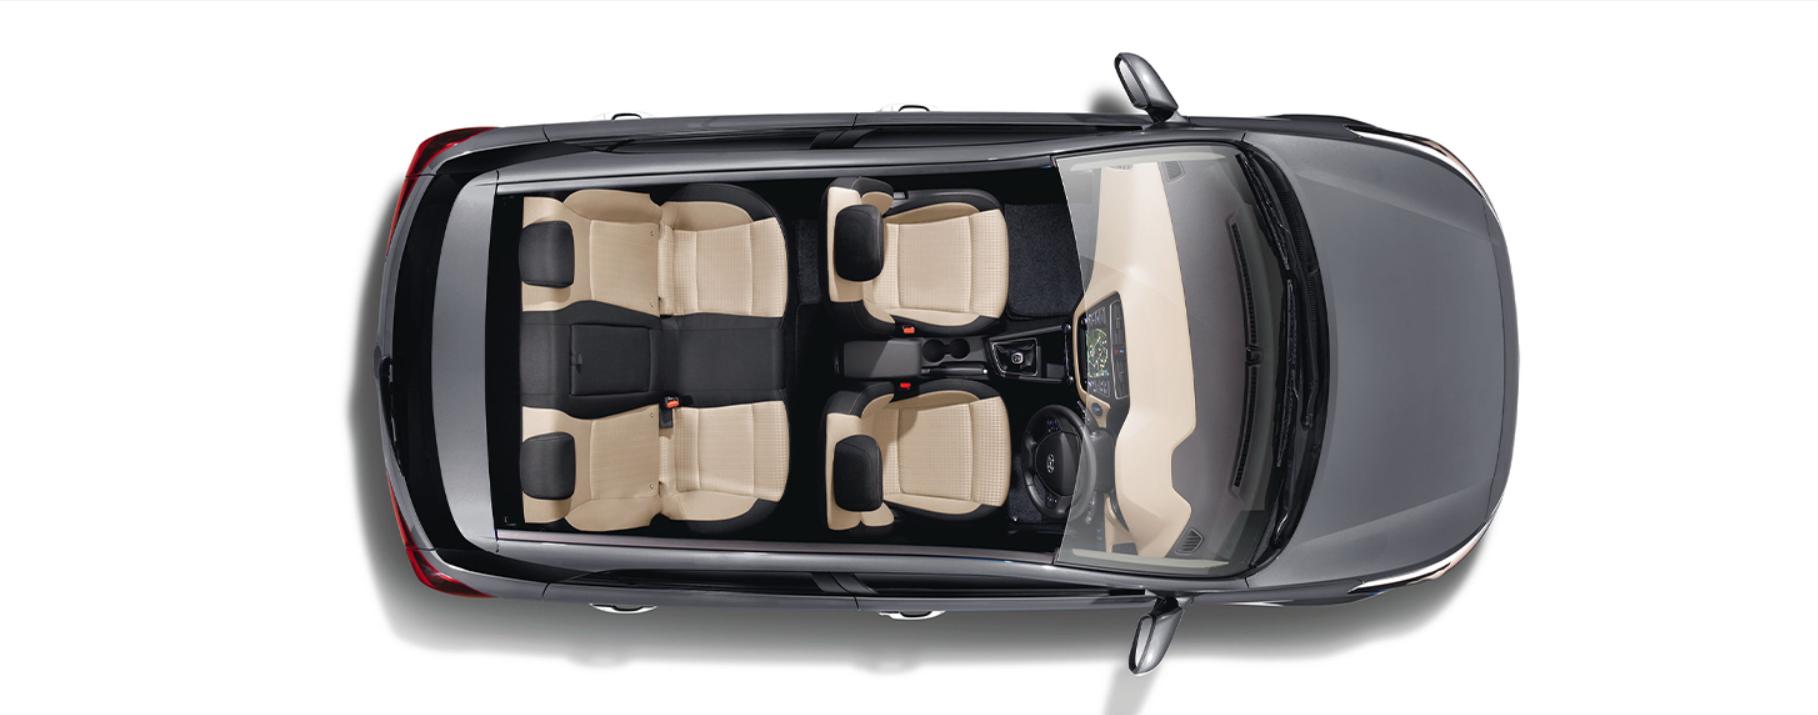 Hyundai i20 2020 Interiors